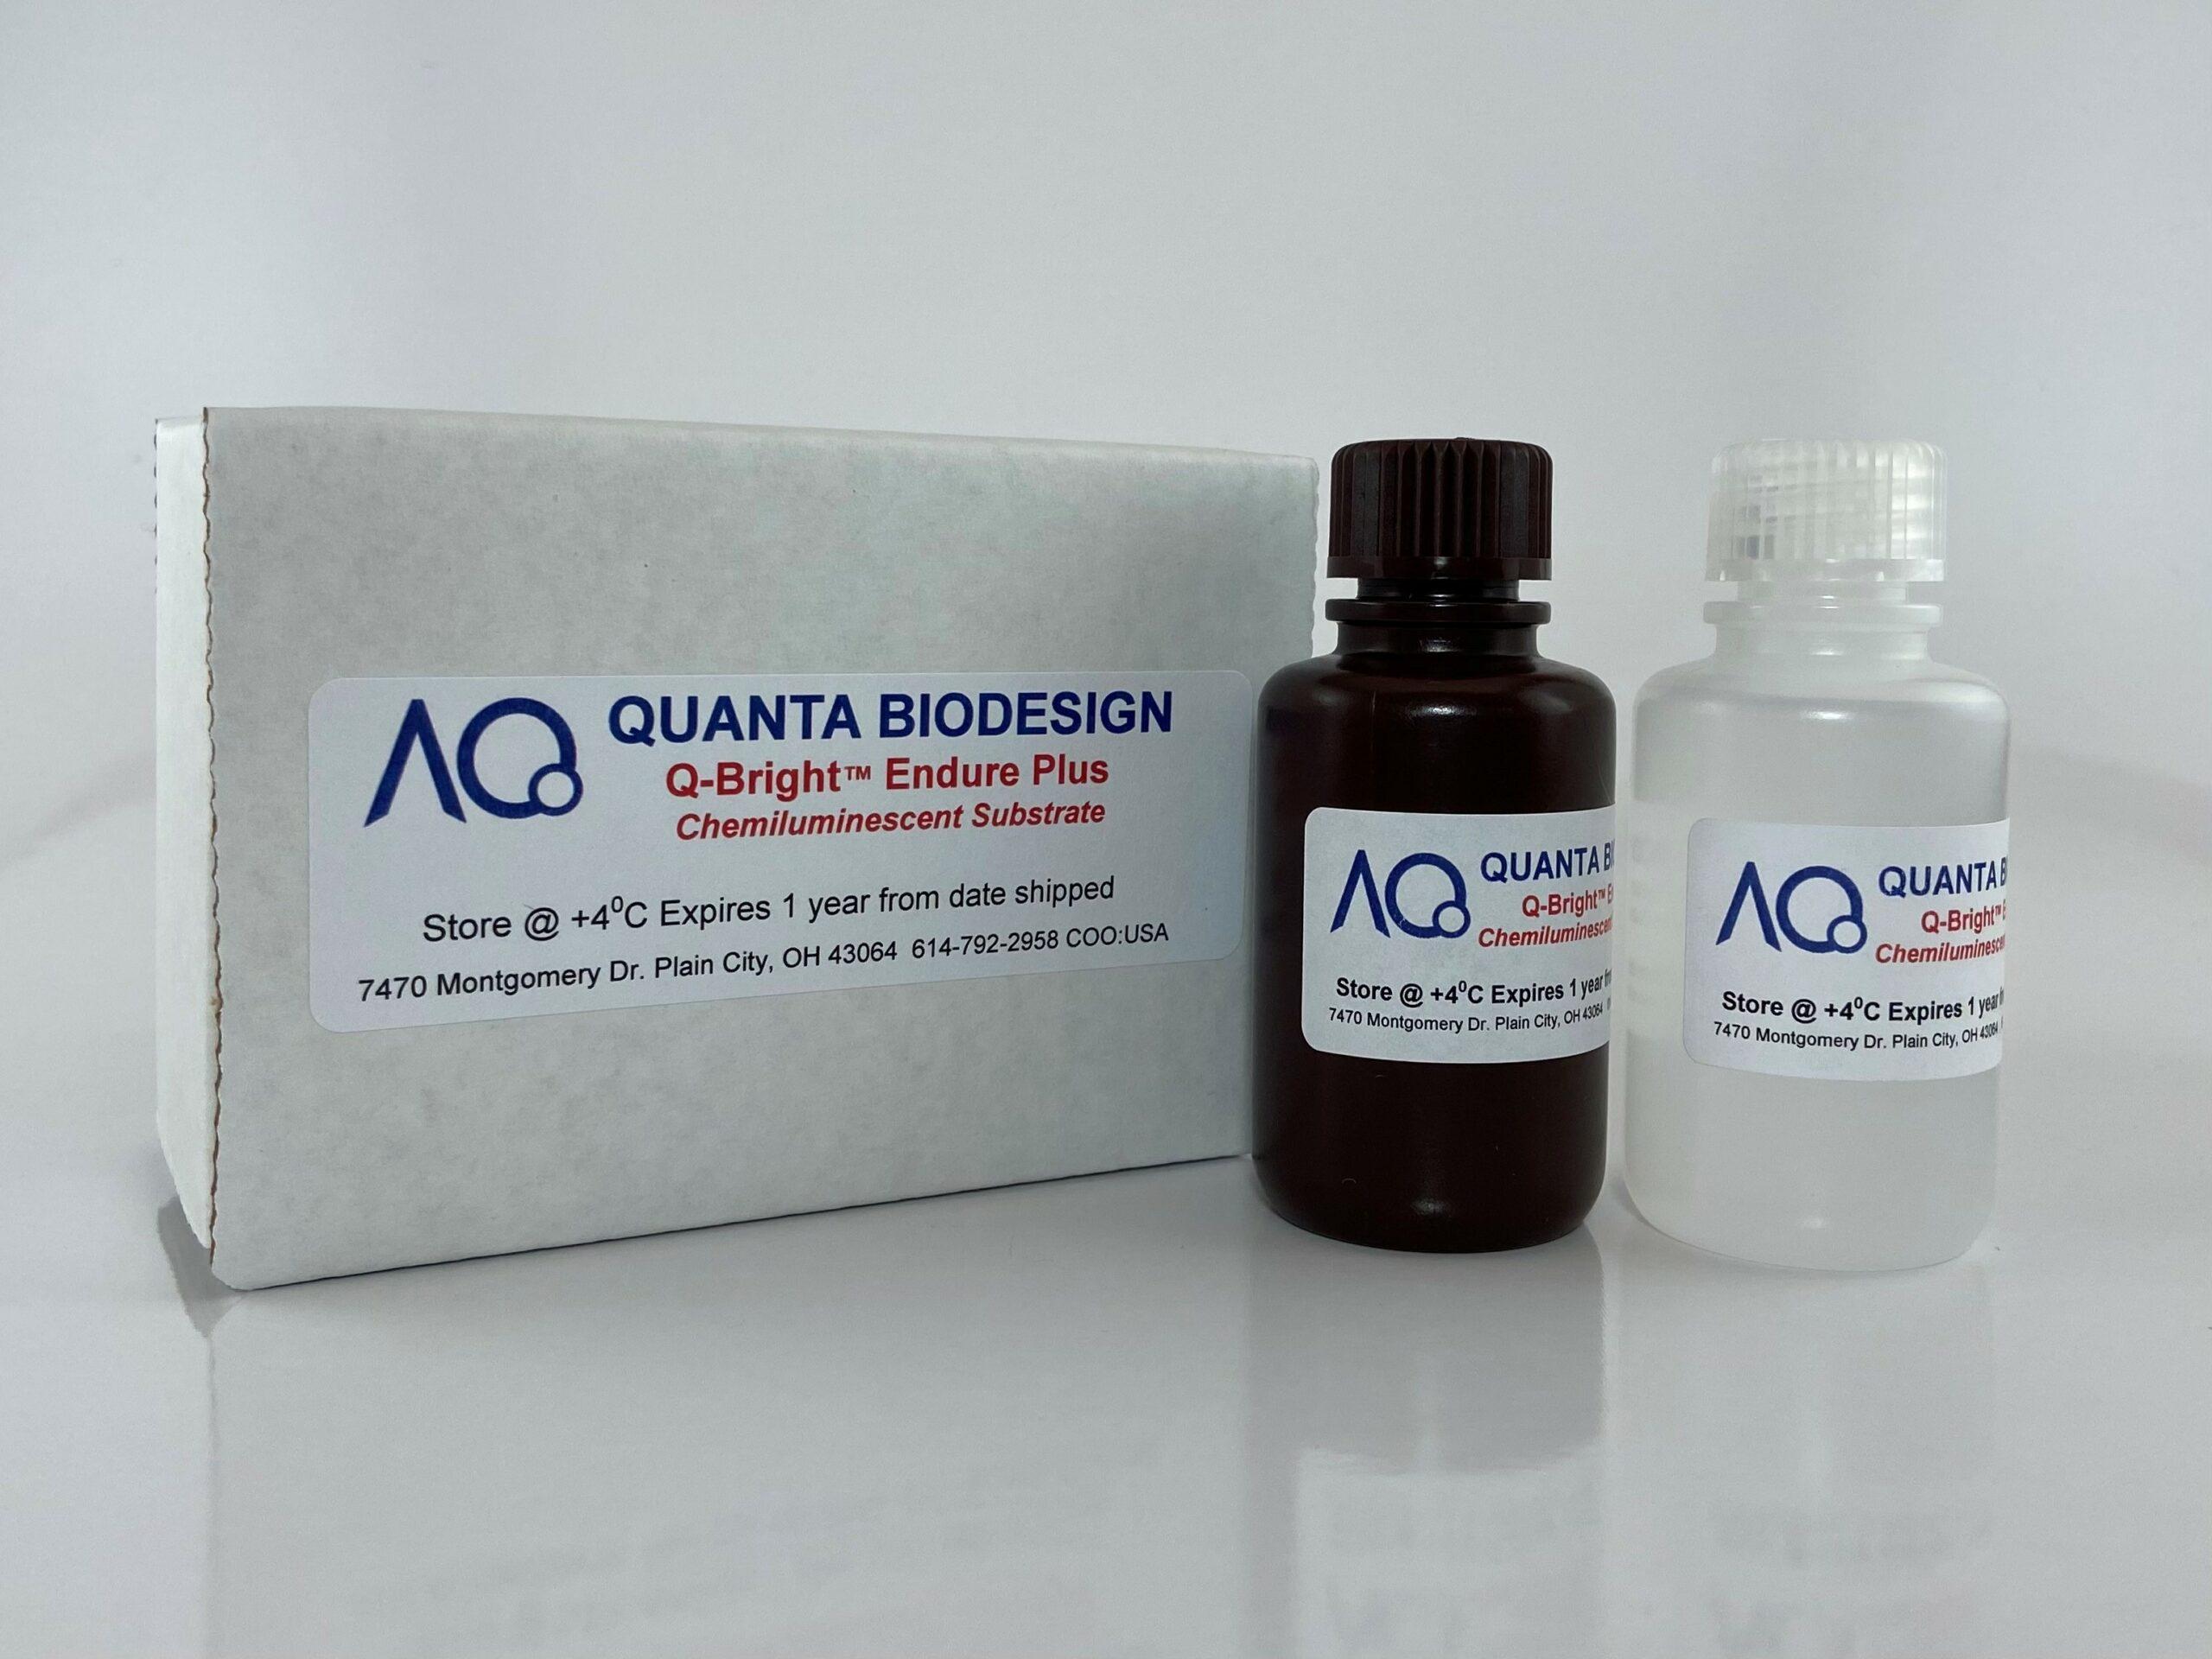 Q-Bright® Endure Plus Chemiluminescent Detection Kit